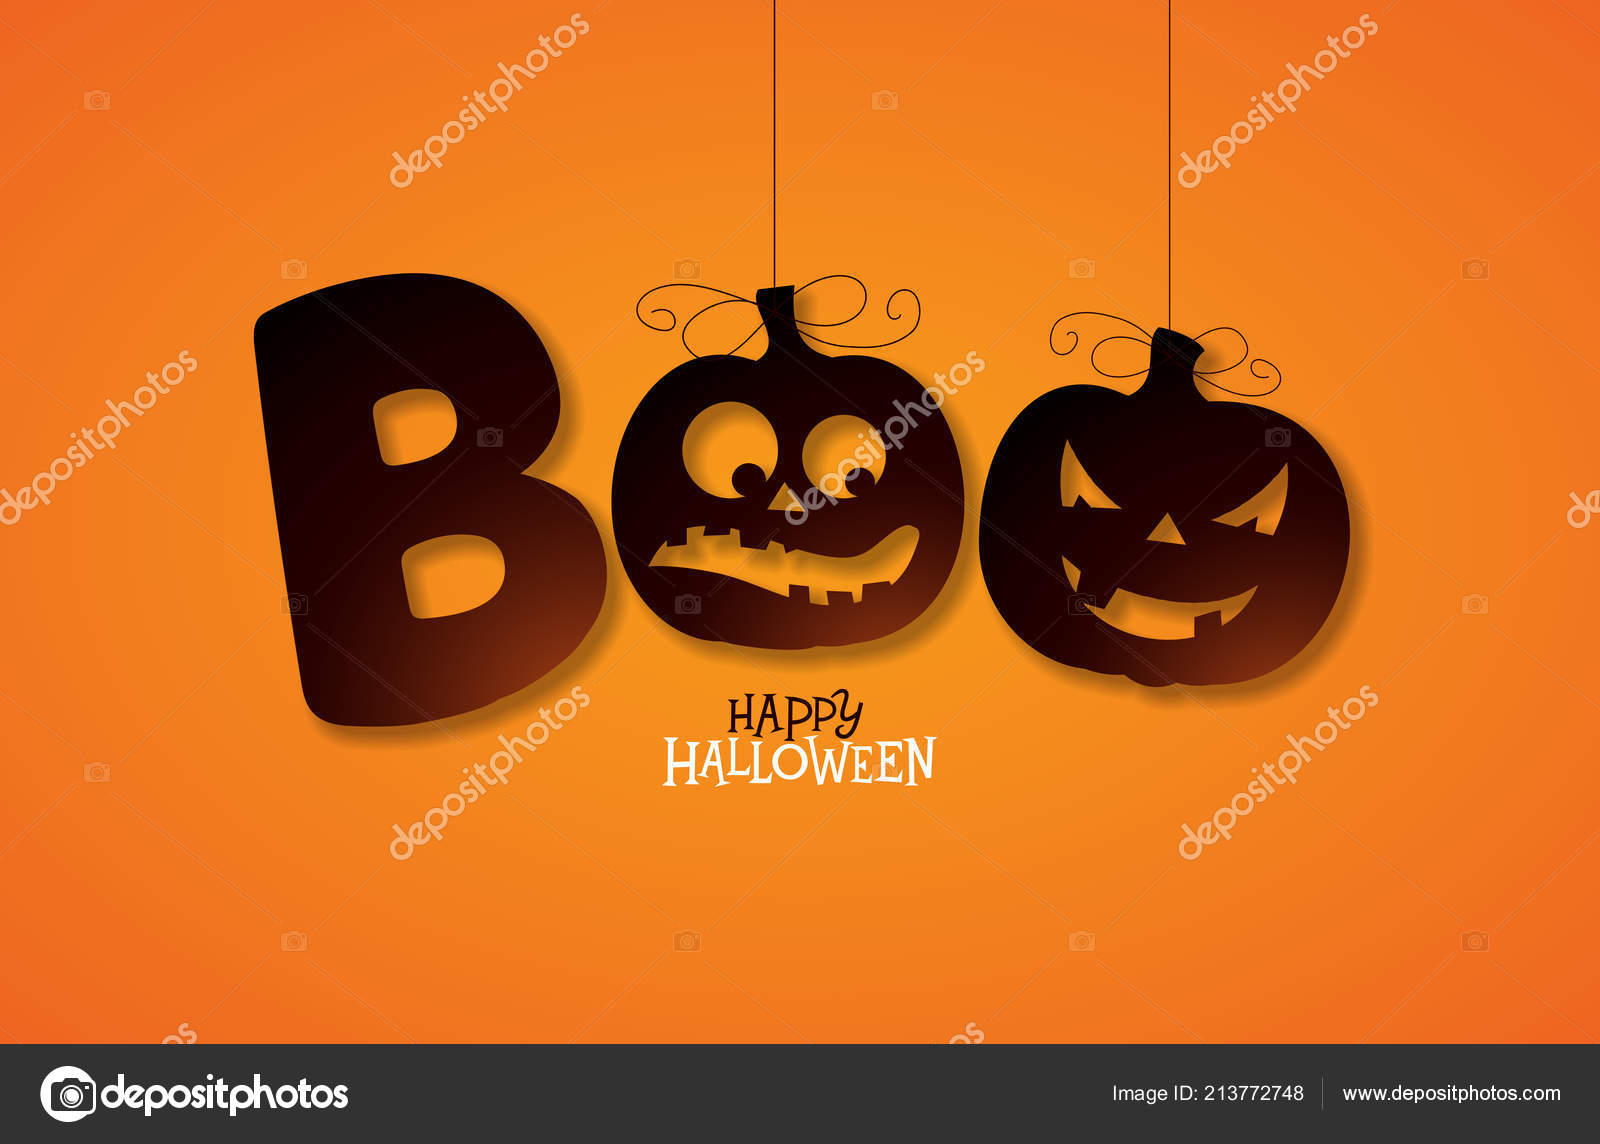 Happy Halloween Pumpkin 2017 Invitation Psd Happy Halloween Card